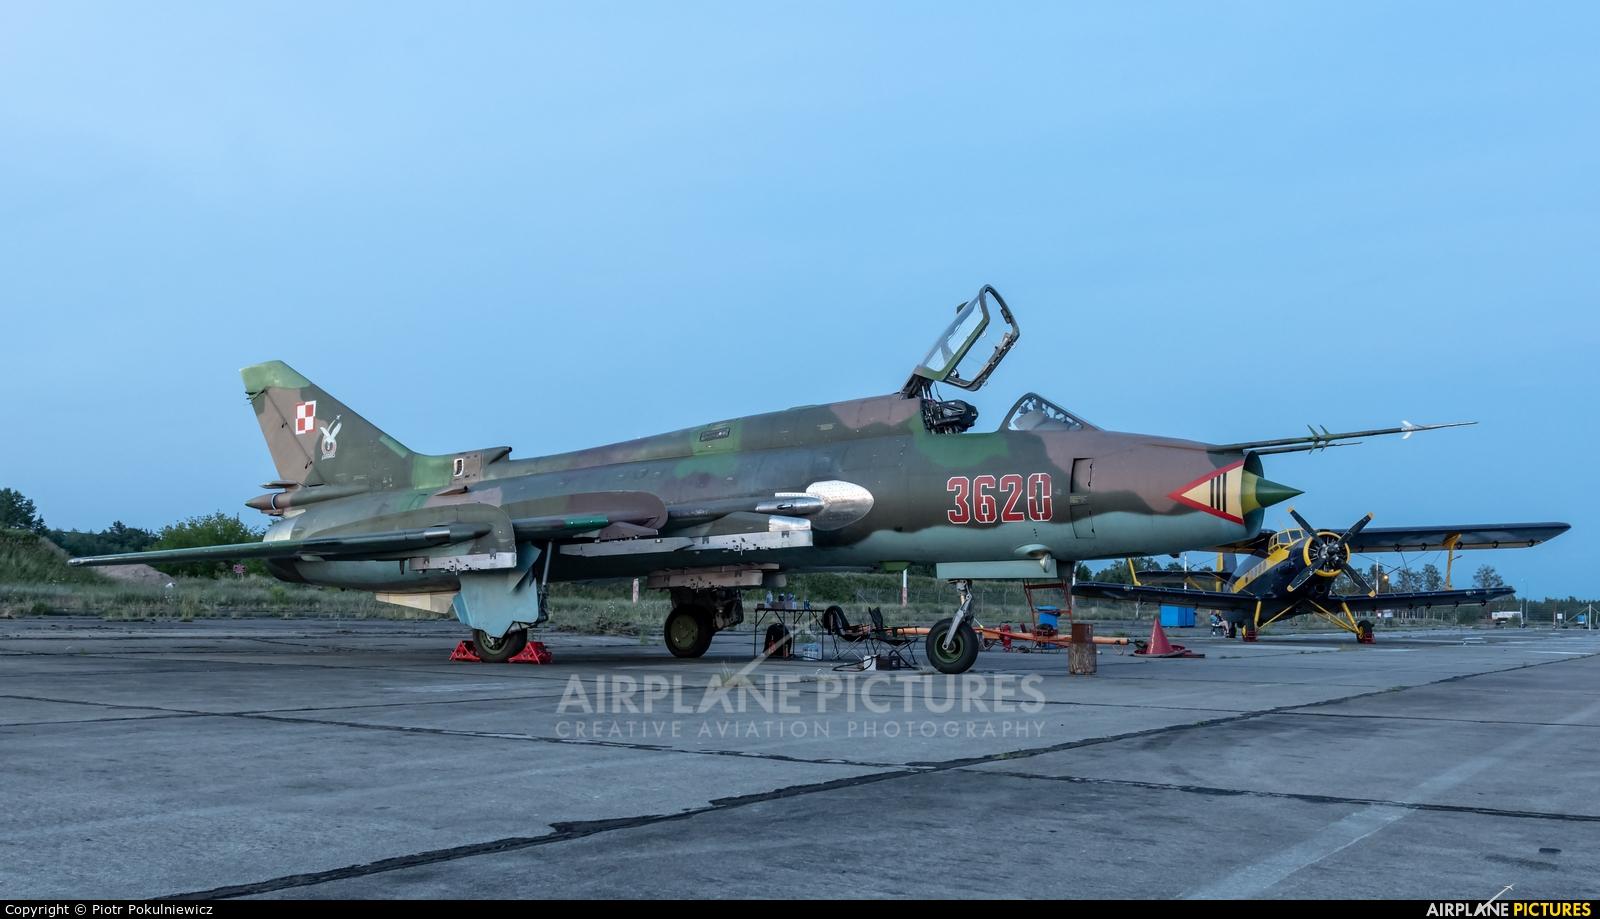 Poland - Air Force 3620 aircraft at Piła